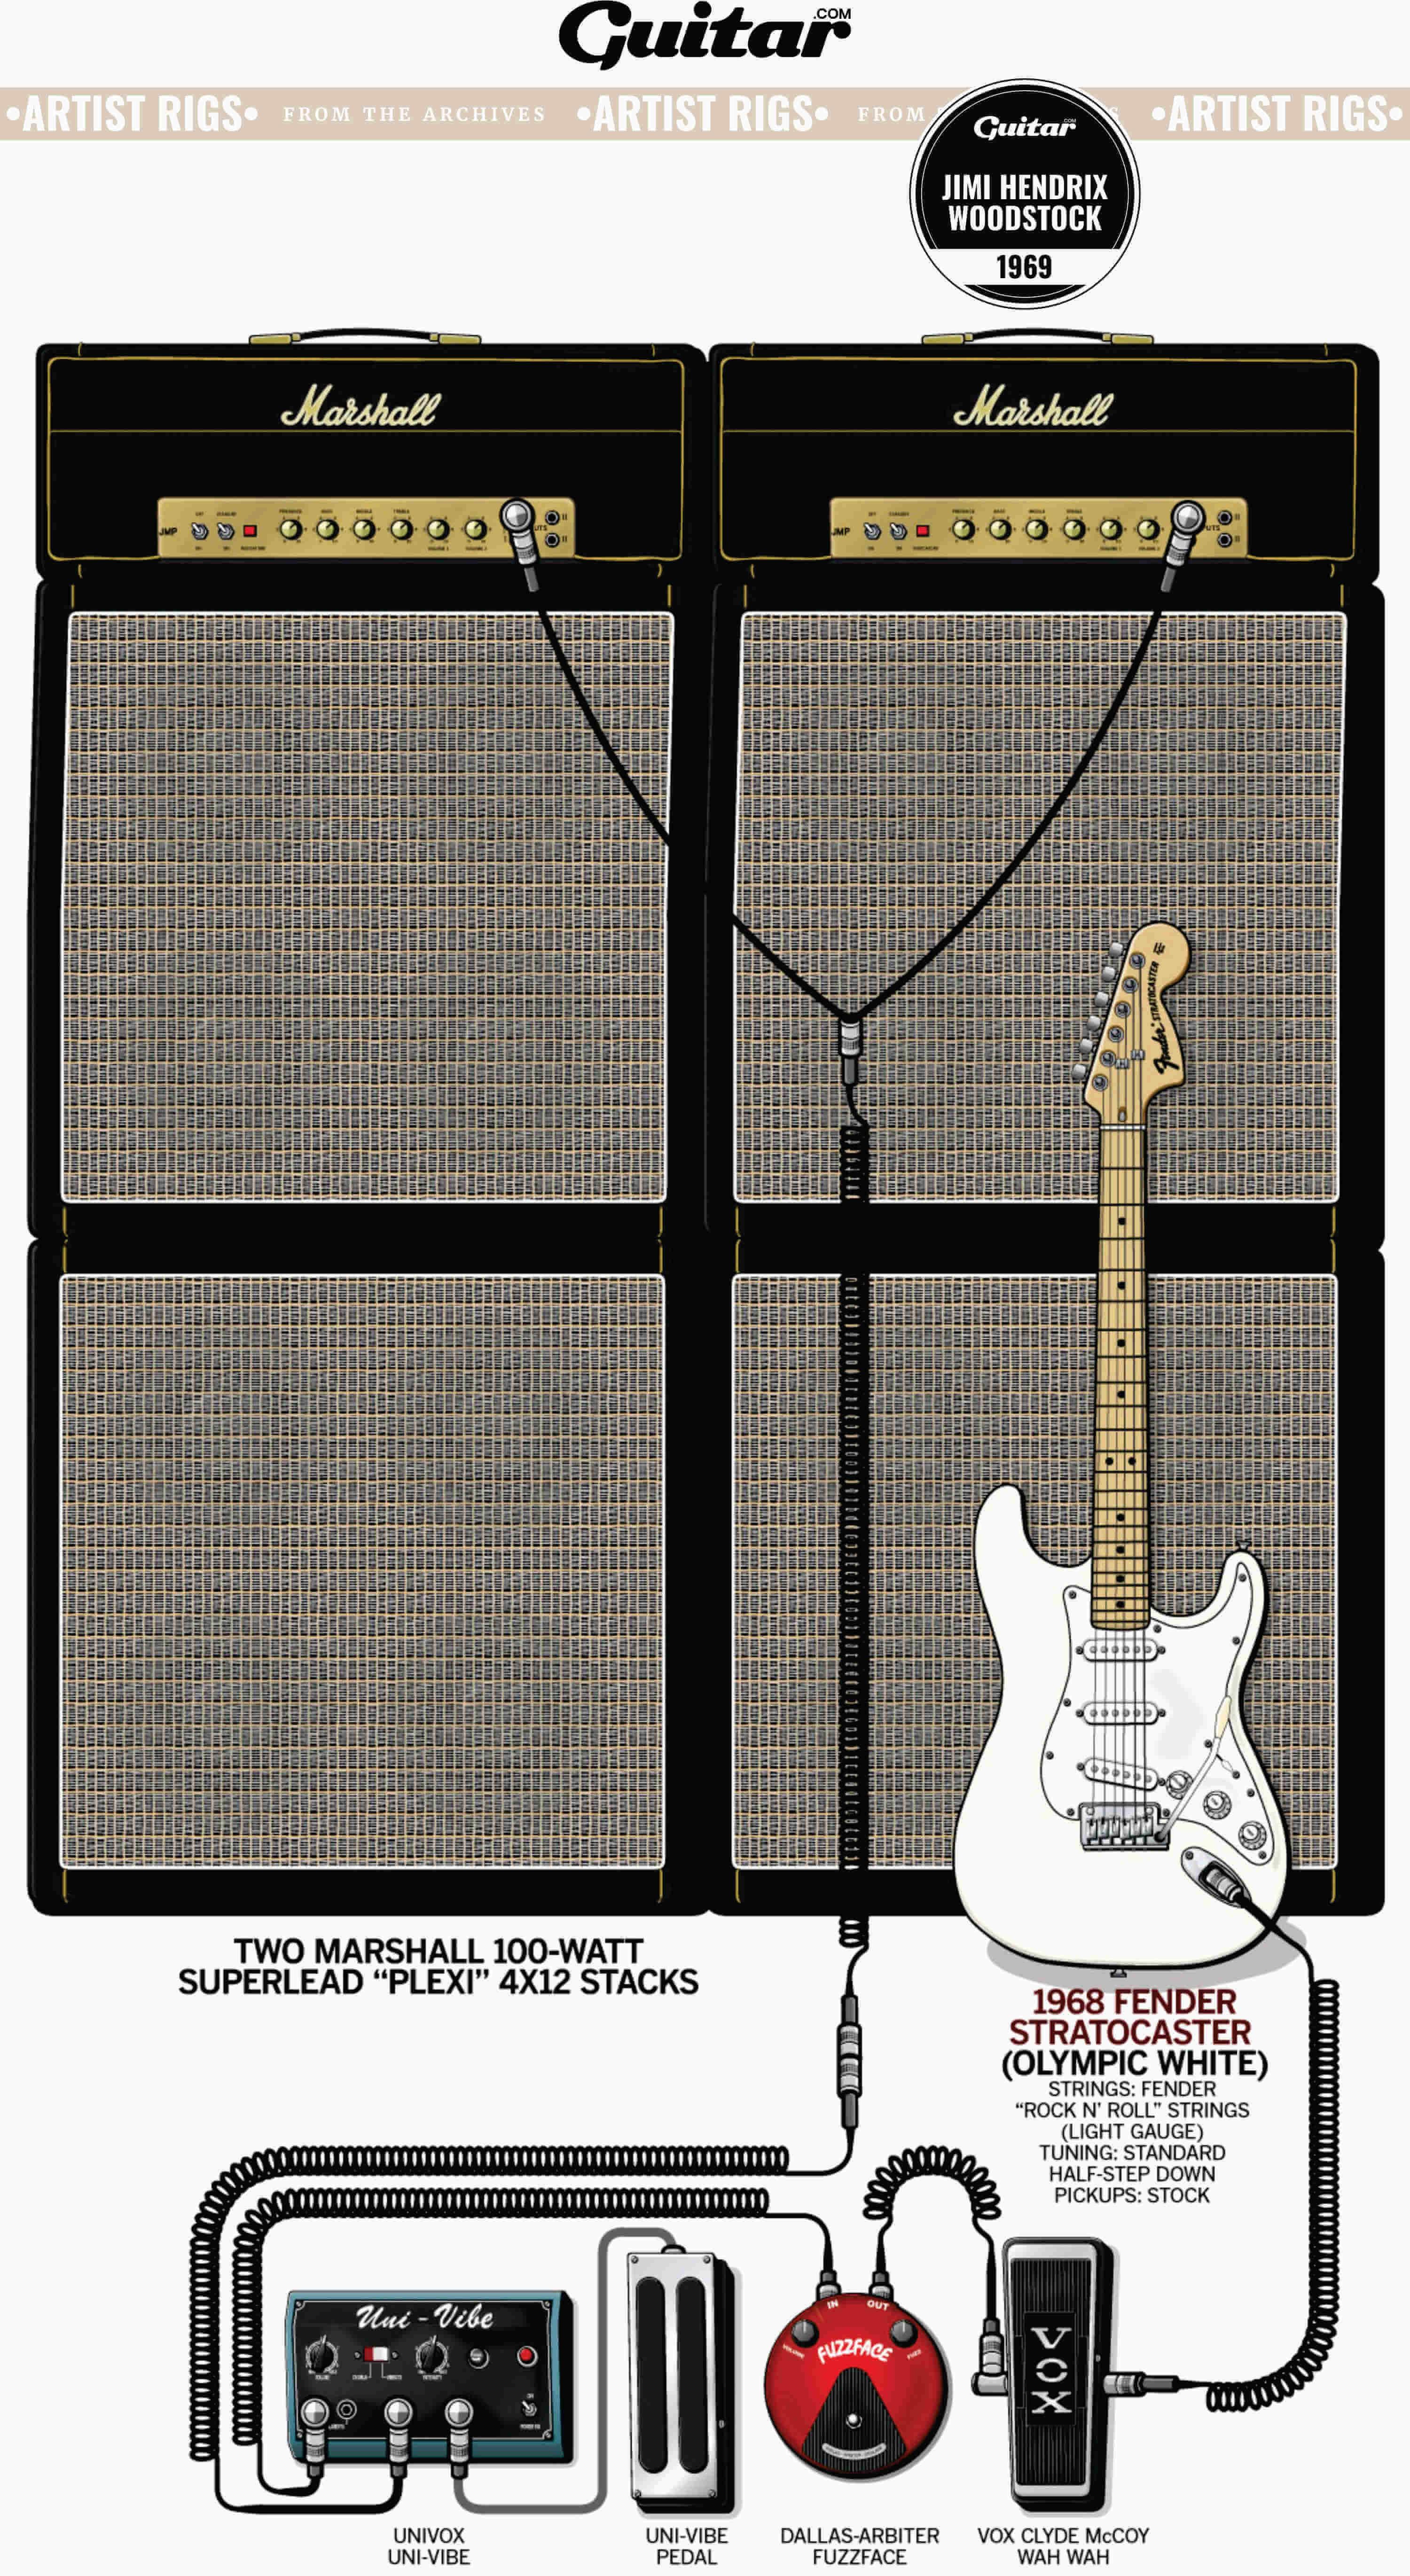 Rig Diagram: Jimi Hendrix, Woodstock (1969)